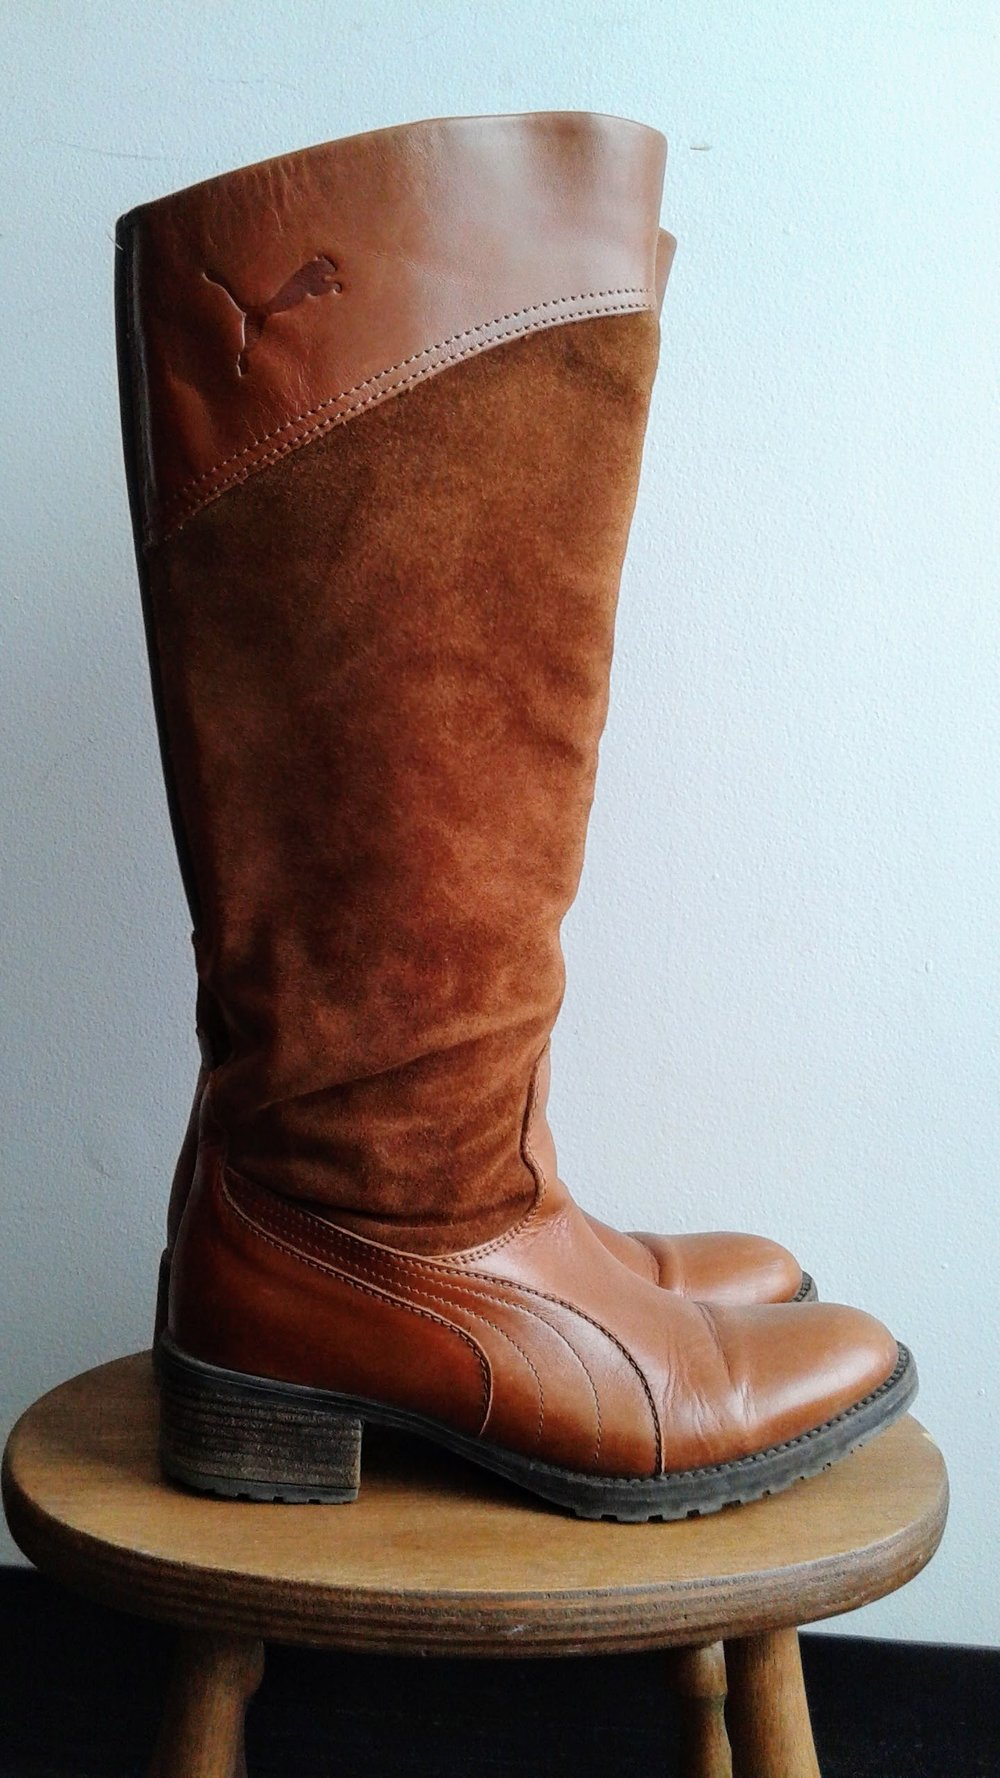 Puma boots; S6, $62